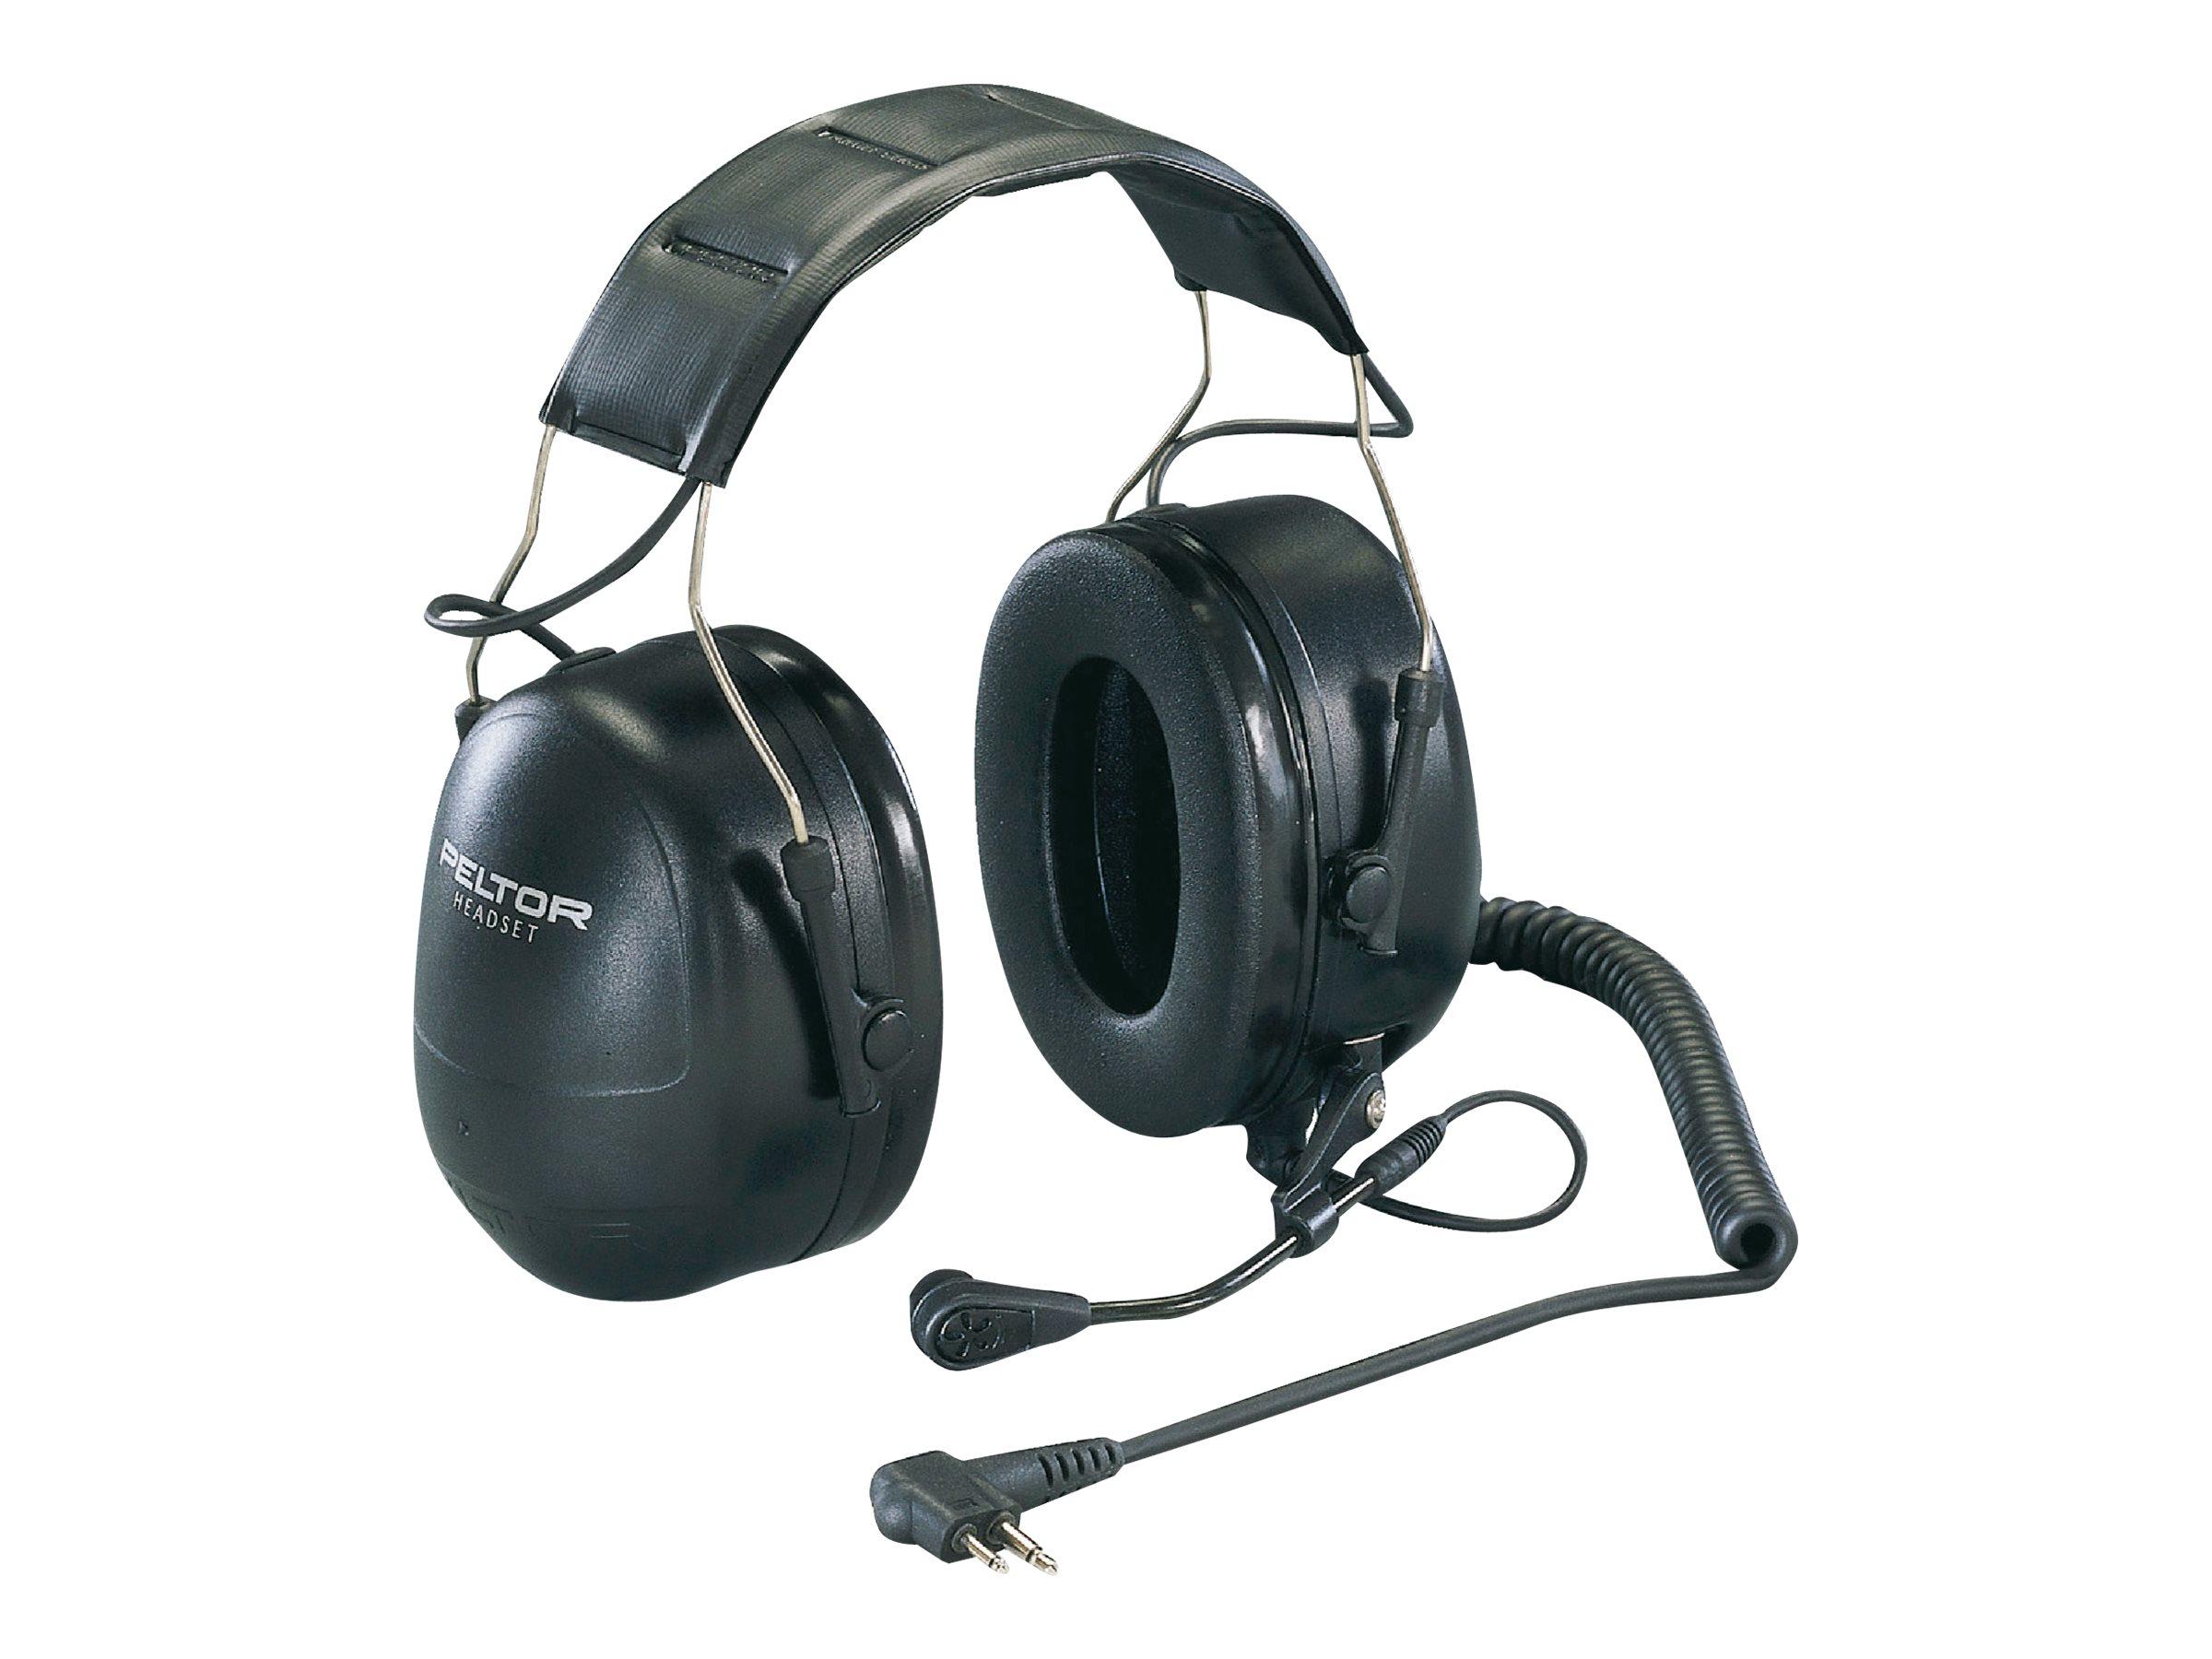 3M Peltor Flex MT53H79P3E-77 - Headset - Full-Size - kabelgebunden - Schwarz